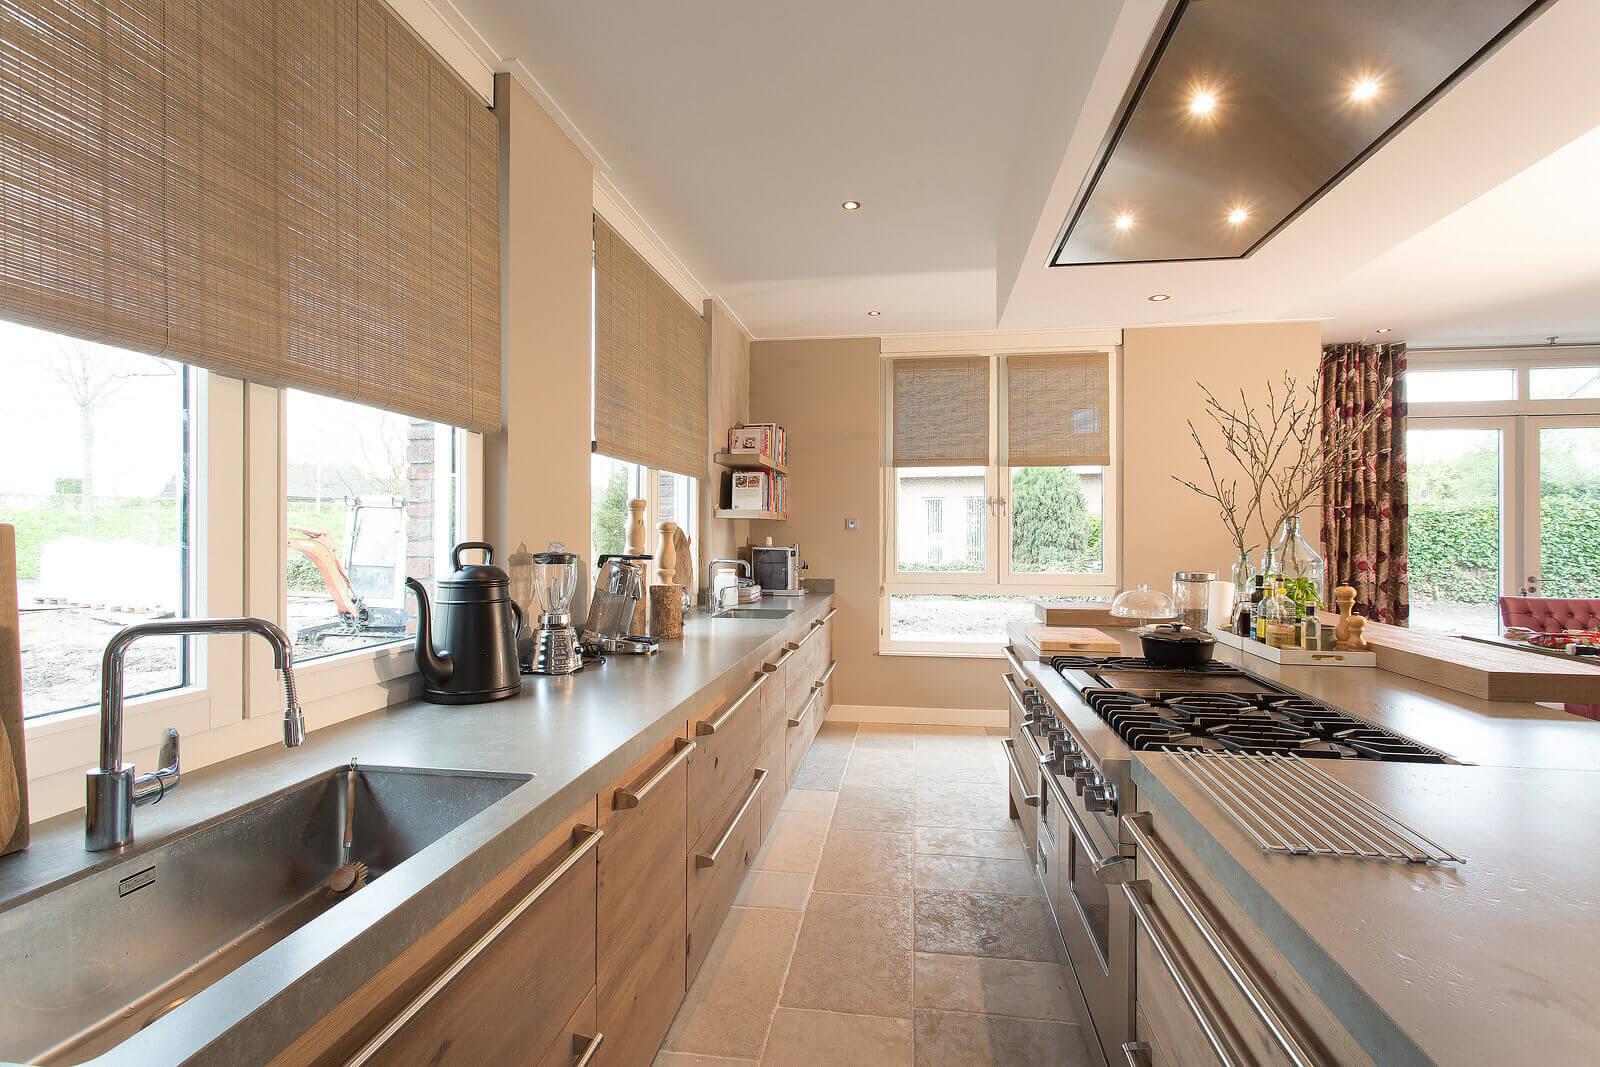 Parallelle keukens